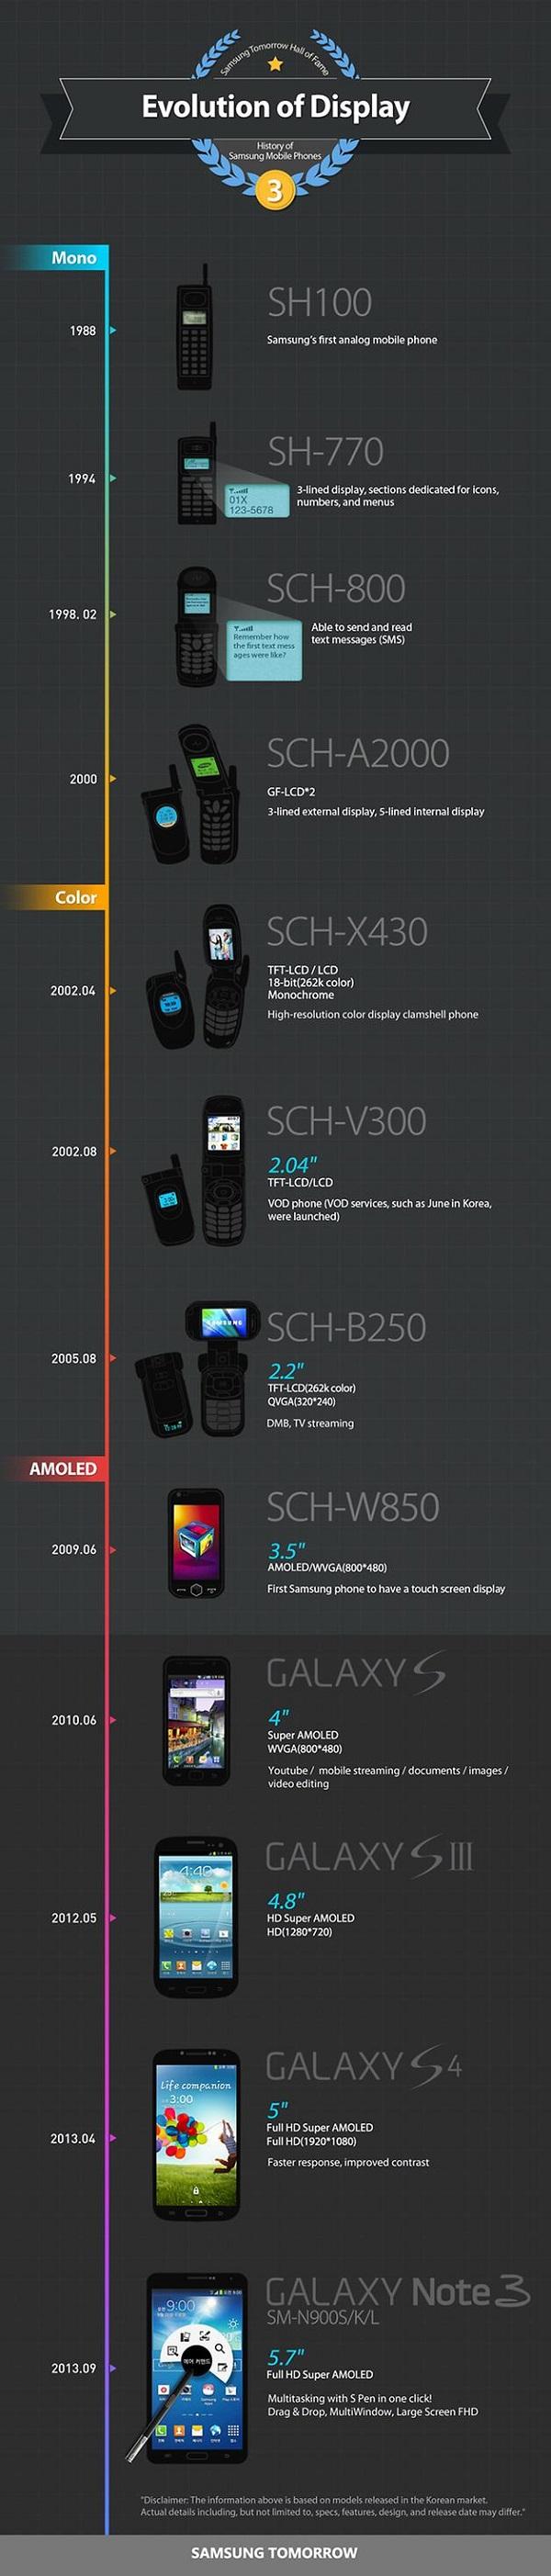 Samsung Mobile Phones Evolution of Display Infographic